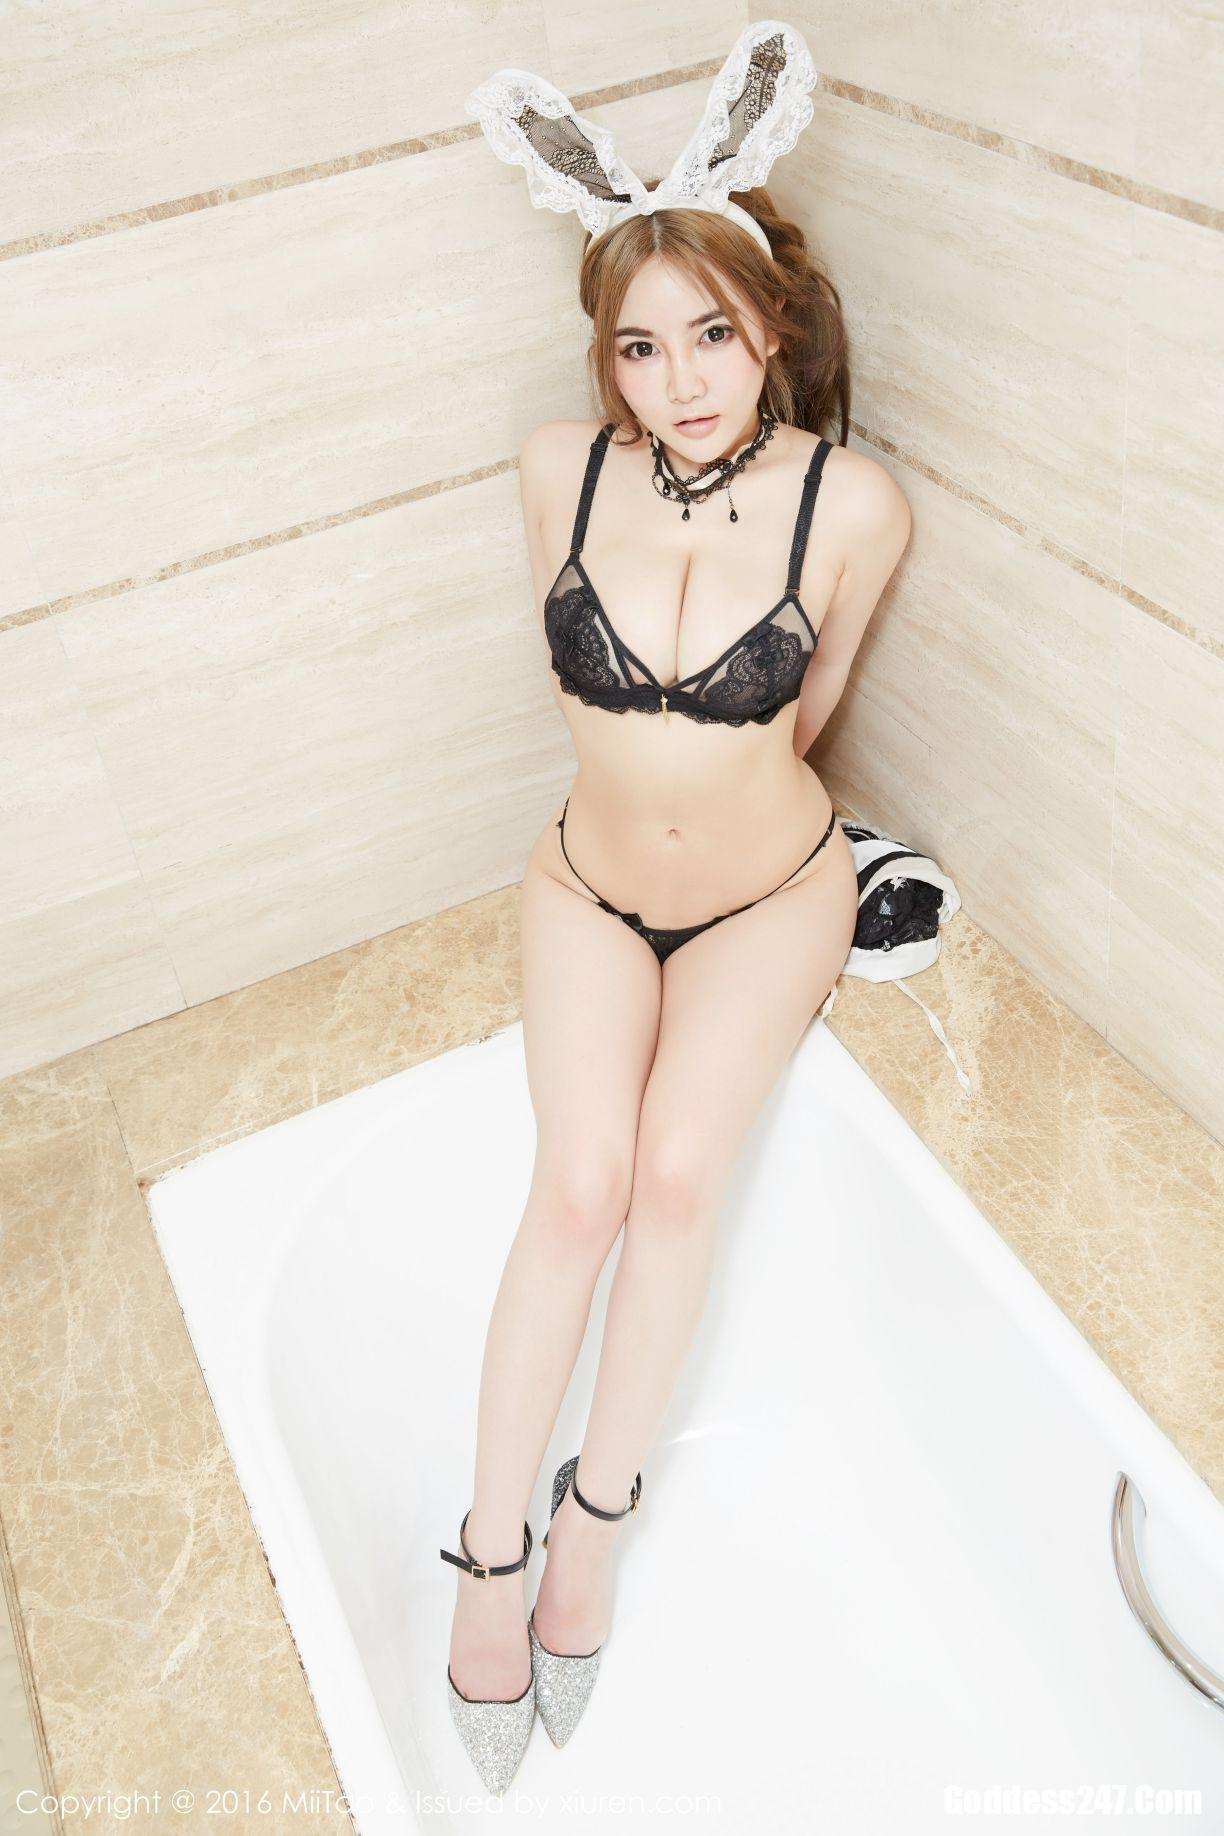 温心怡, MiiTao Vol.006 温心怡, MiiTao Vol.006